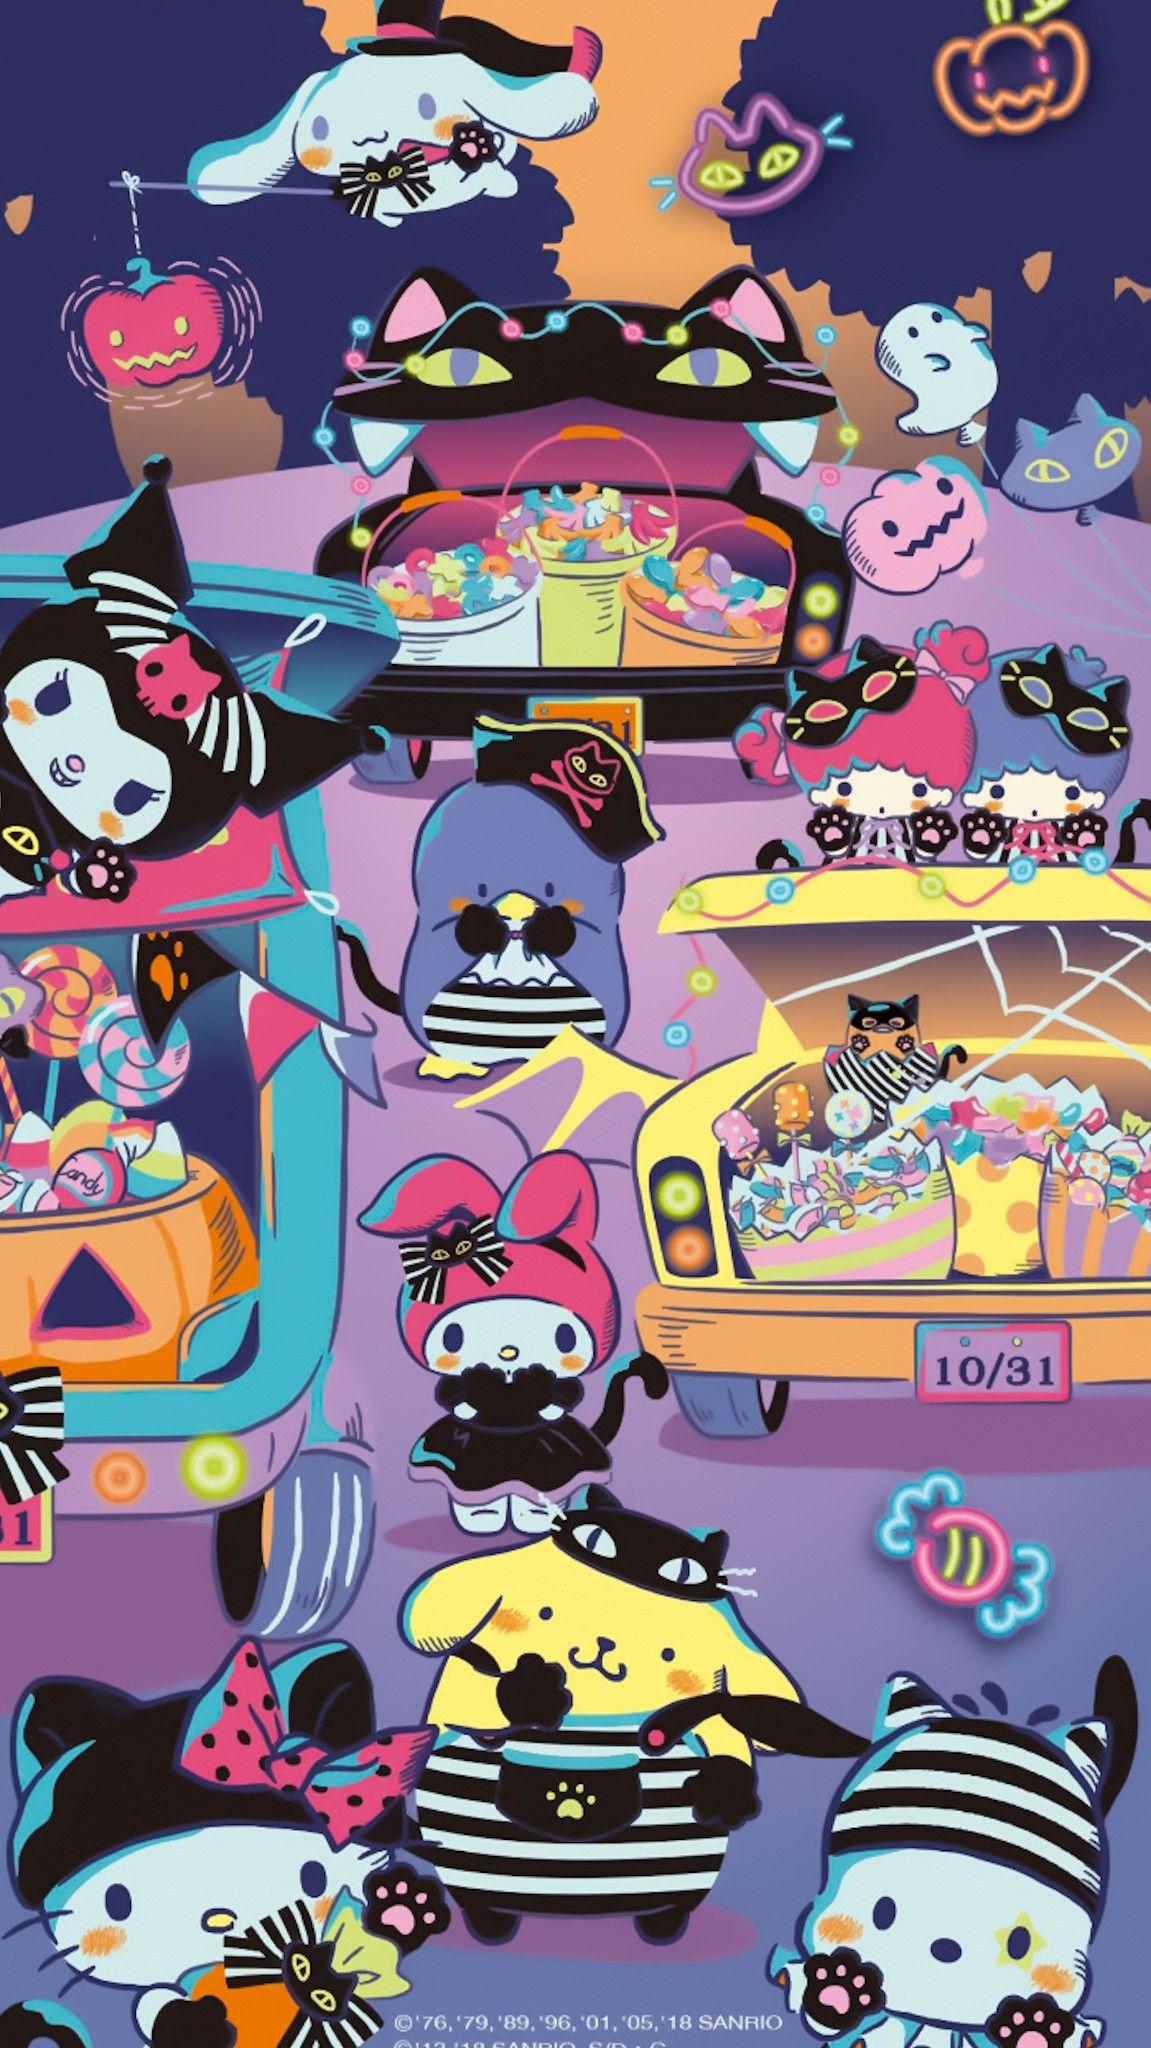 Pin By Sai On Candyland Kawaii Halloween Cute Cartoon Wallpapers Hello Kitty Halloween